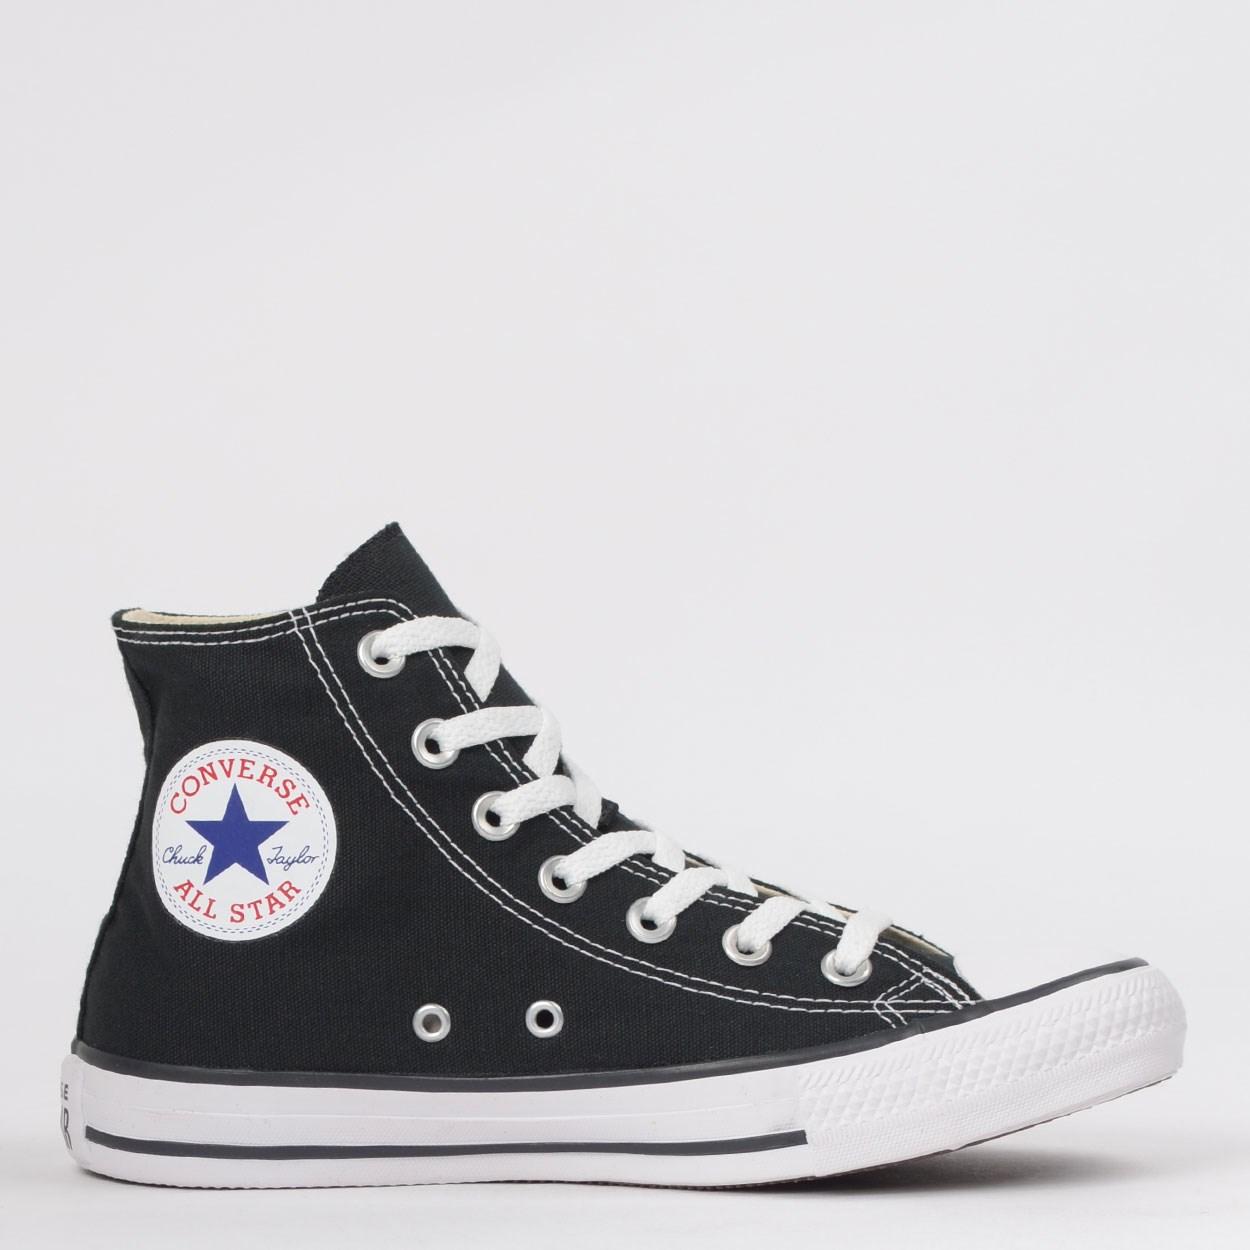 Tênis Converse Chuck Taylor All Star Core Hi Preto Cano médio